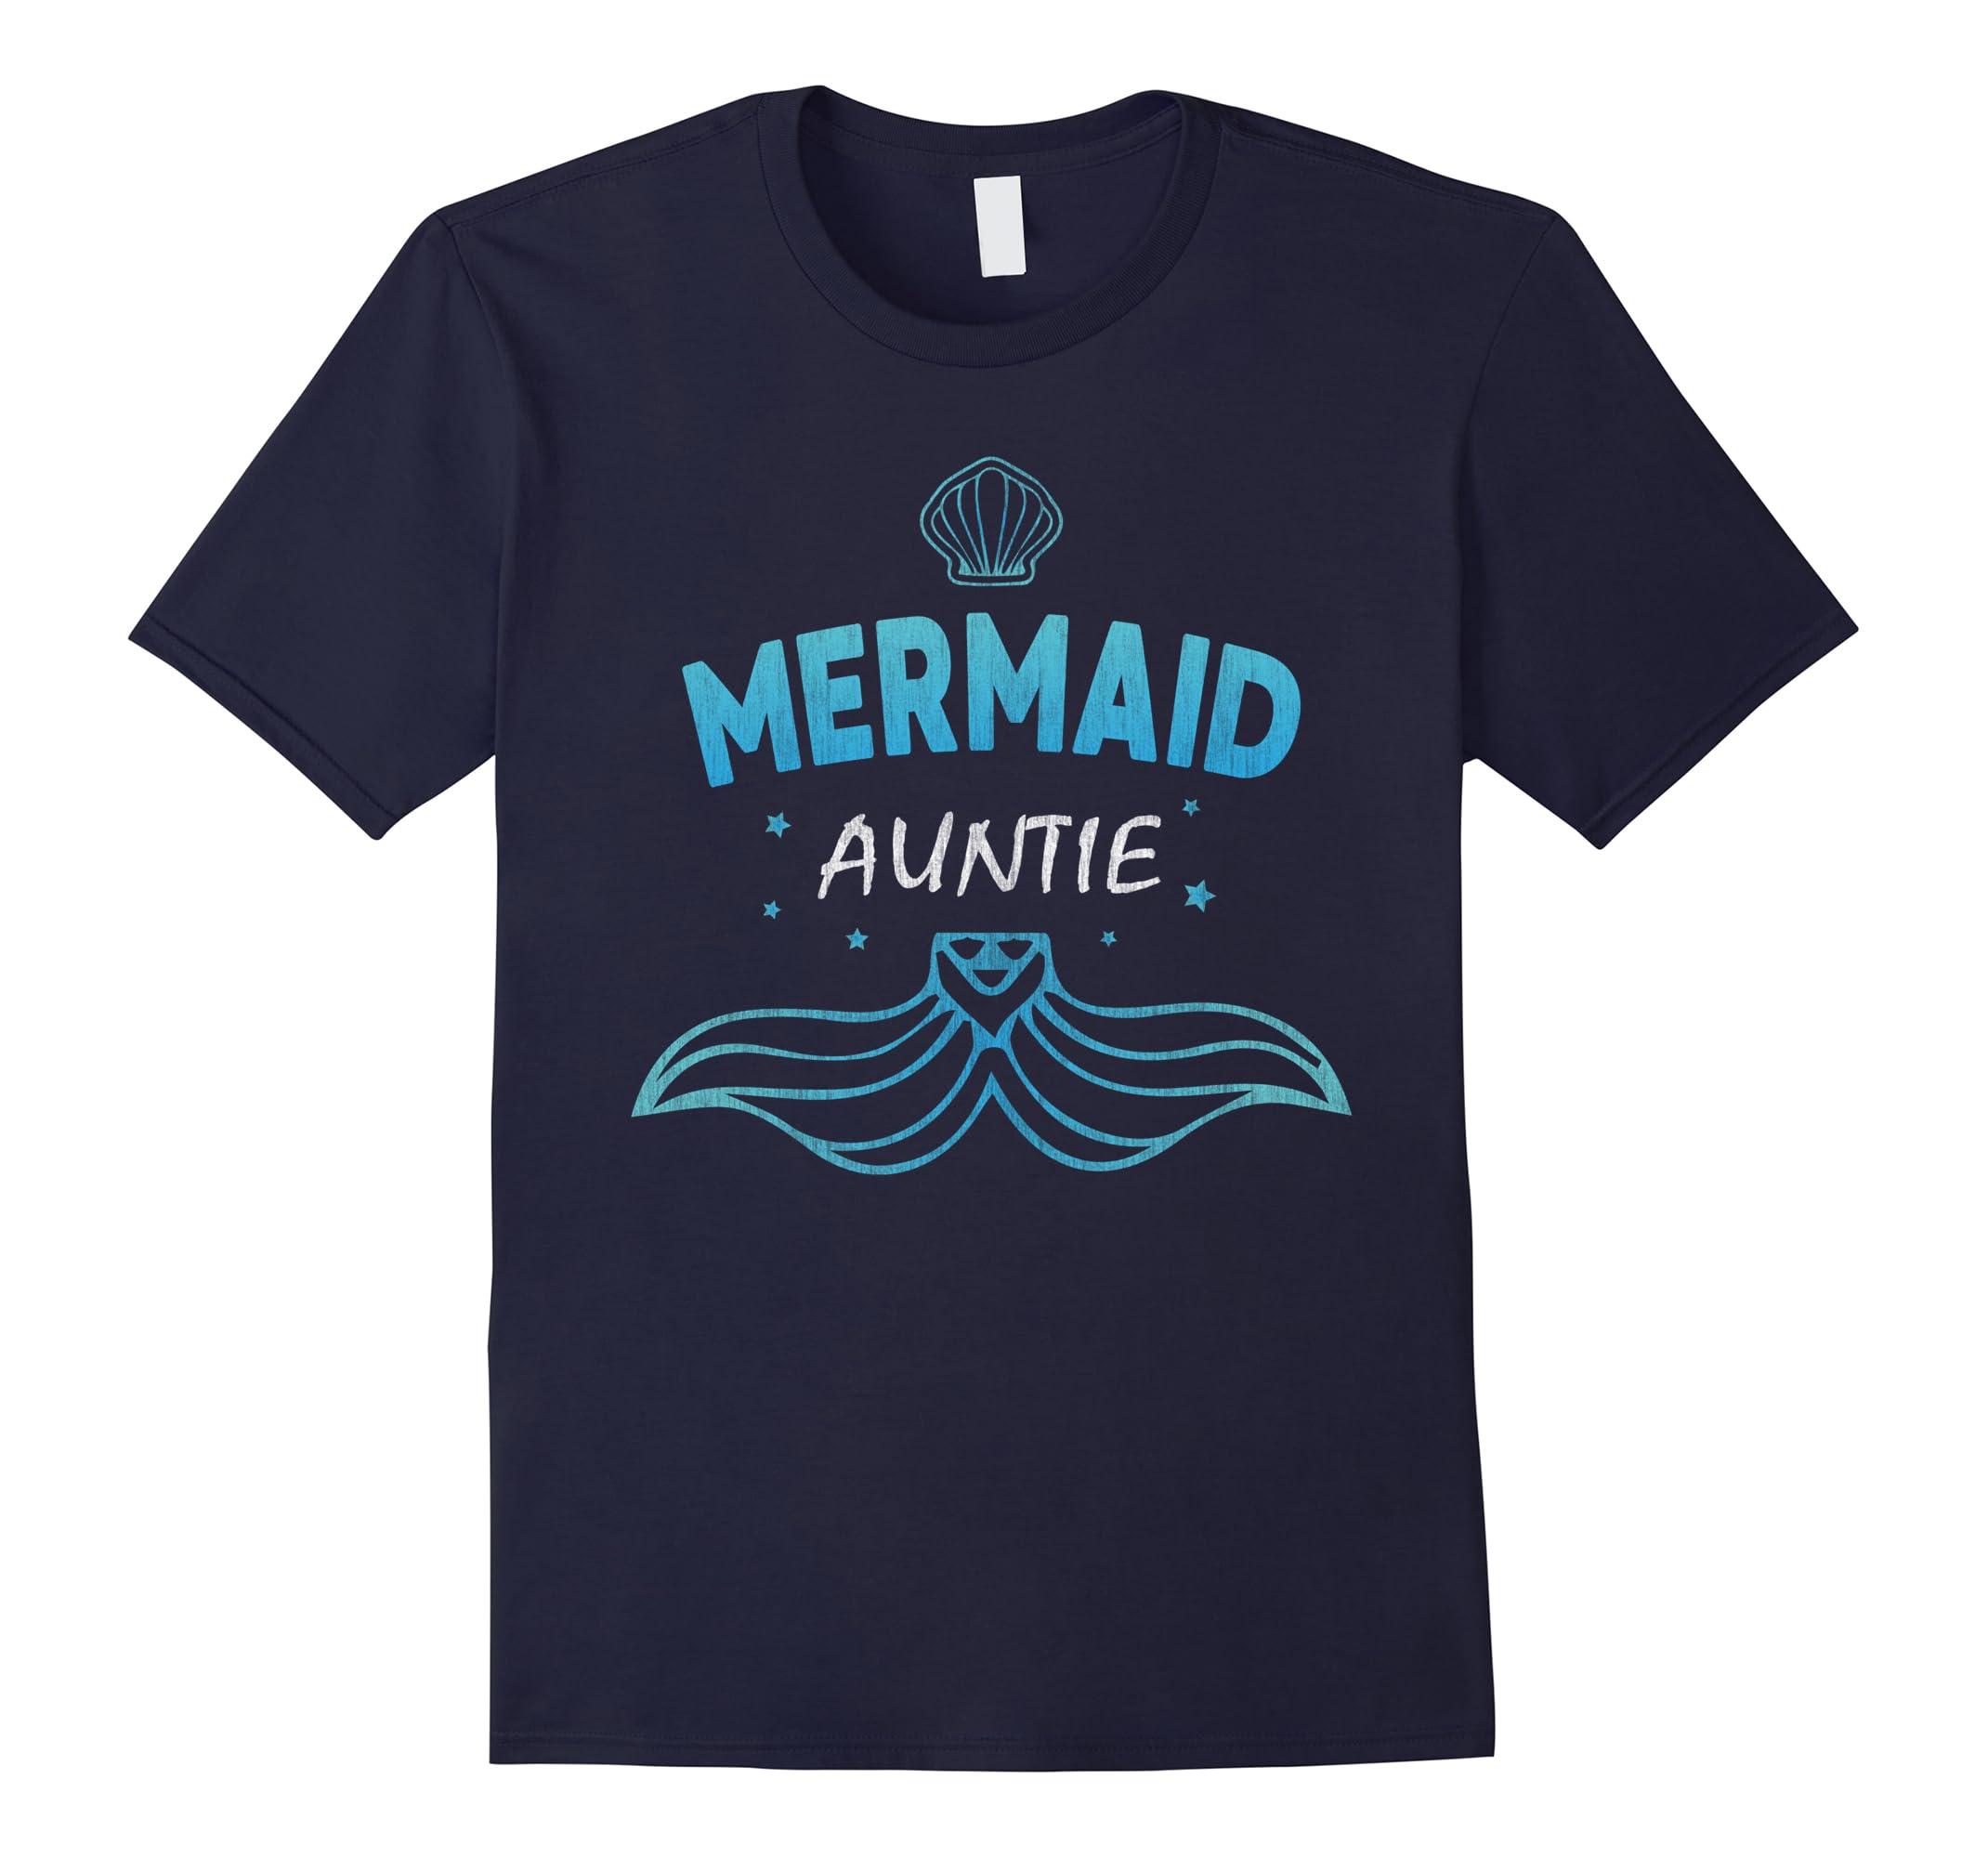 Auntie Mermaid Birthday Party t shirt Women Men Gifts Family-RT